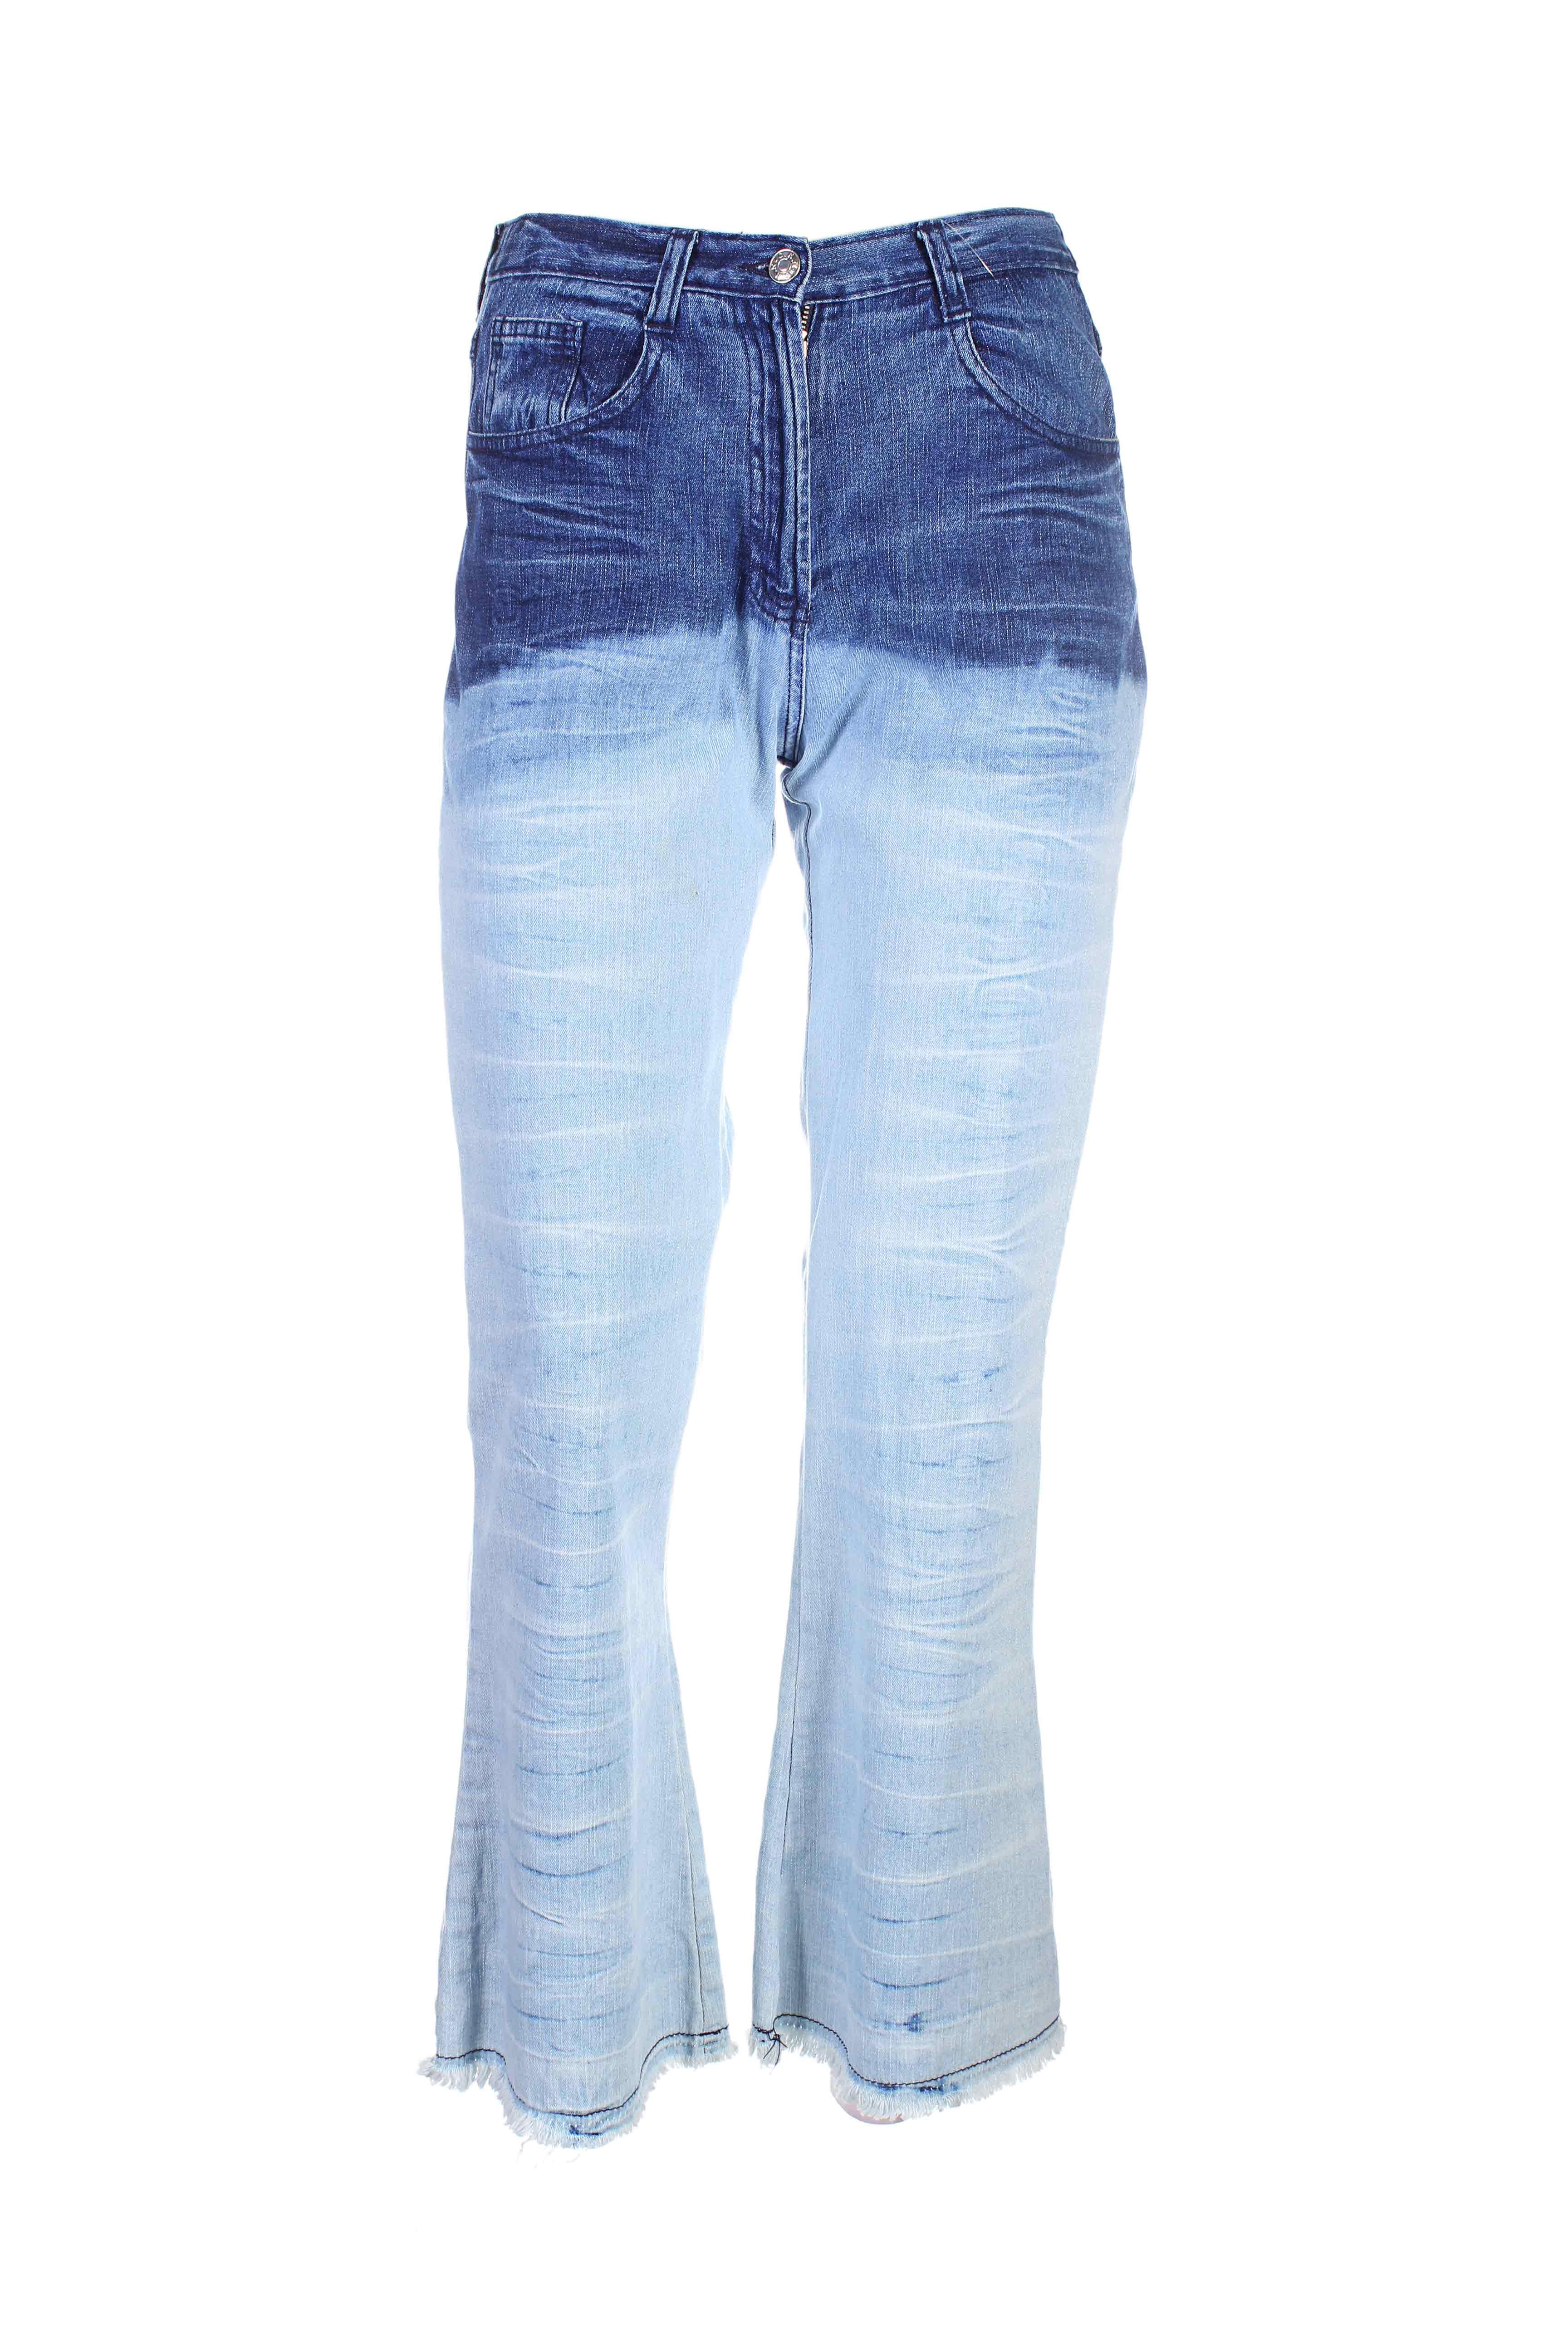 Produit-Jeans-Fille-GINKANA